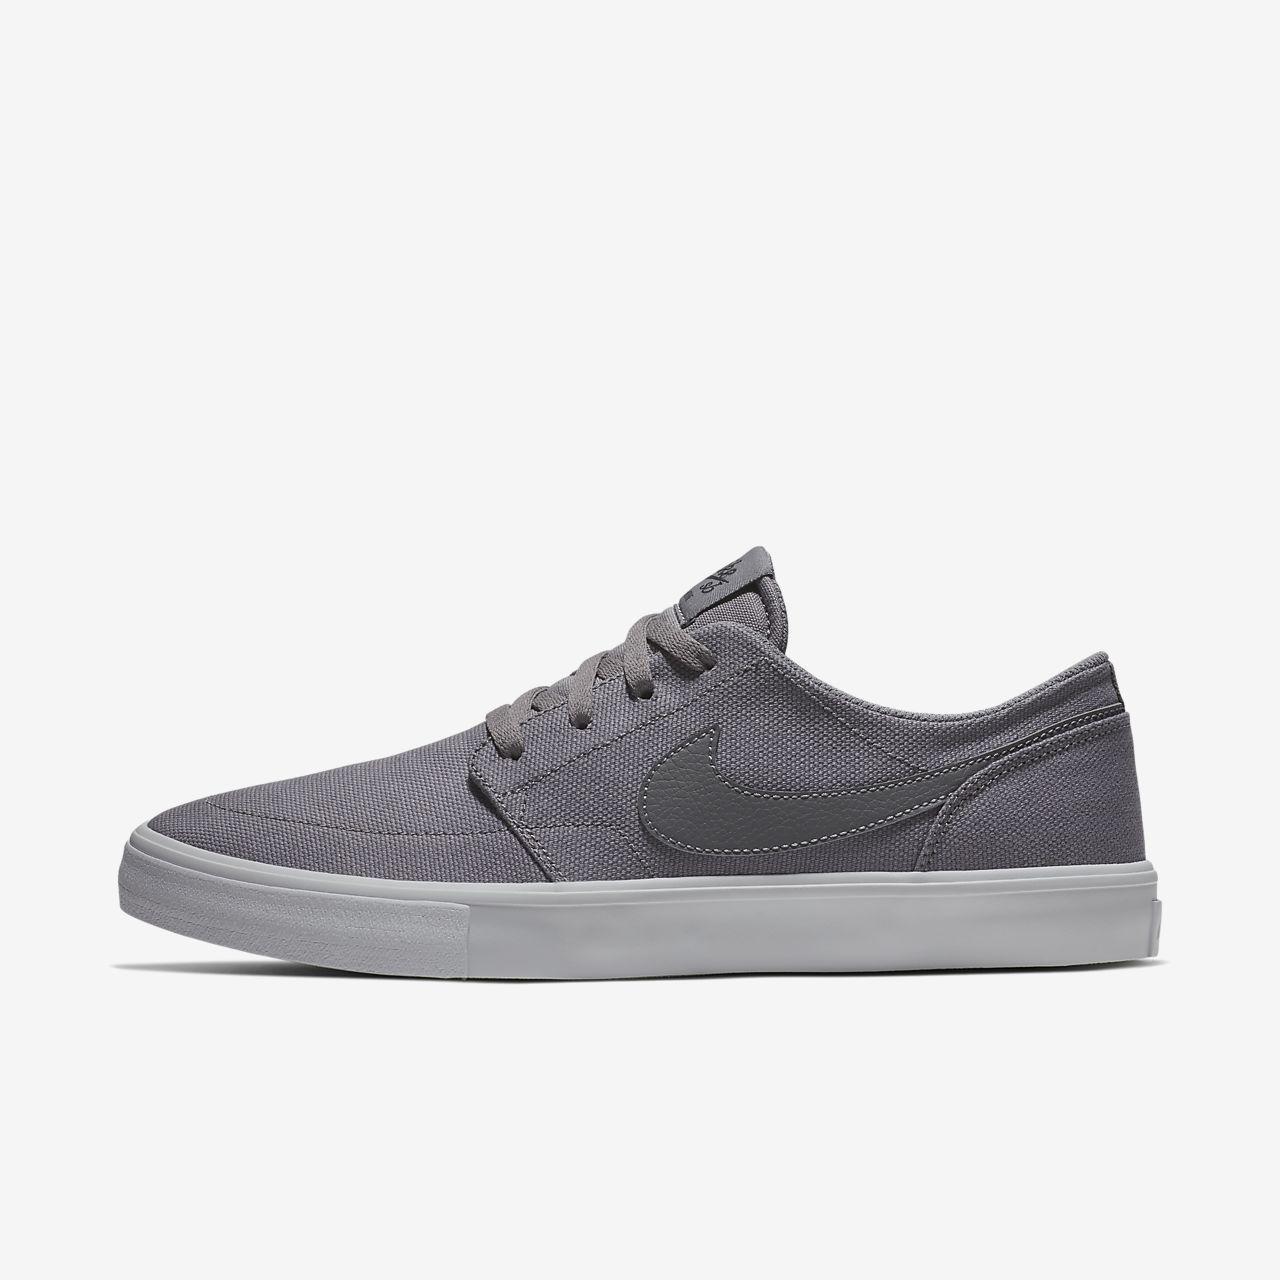 sports shoes c2171 fc6e6 Nike SB Solarsoft Portmore II Canvas Herren-Skateboardschuh